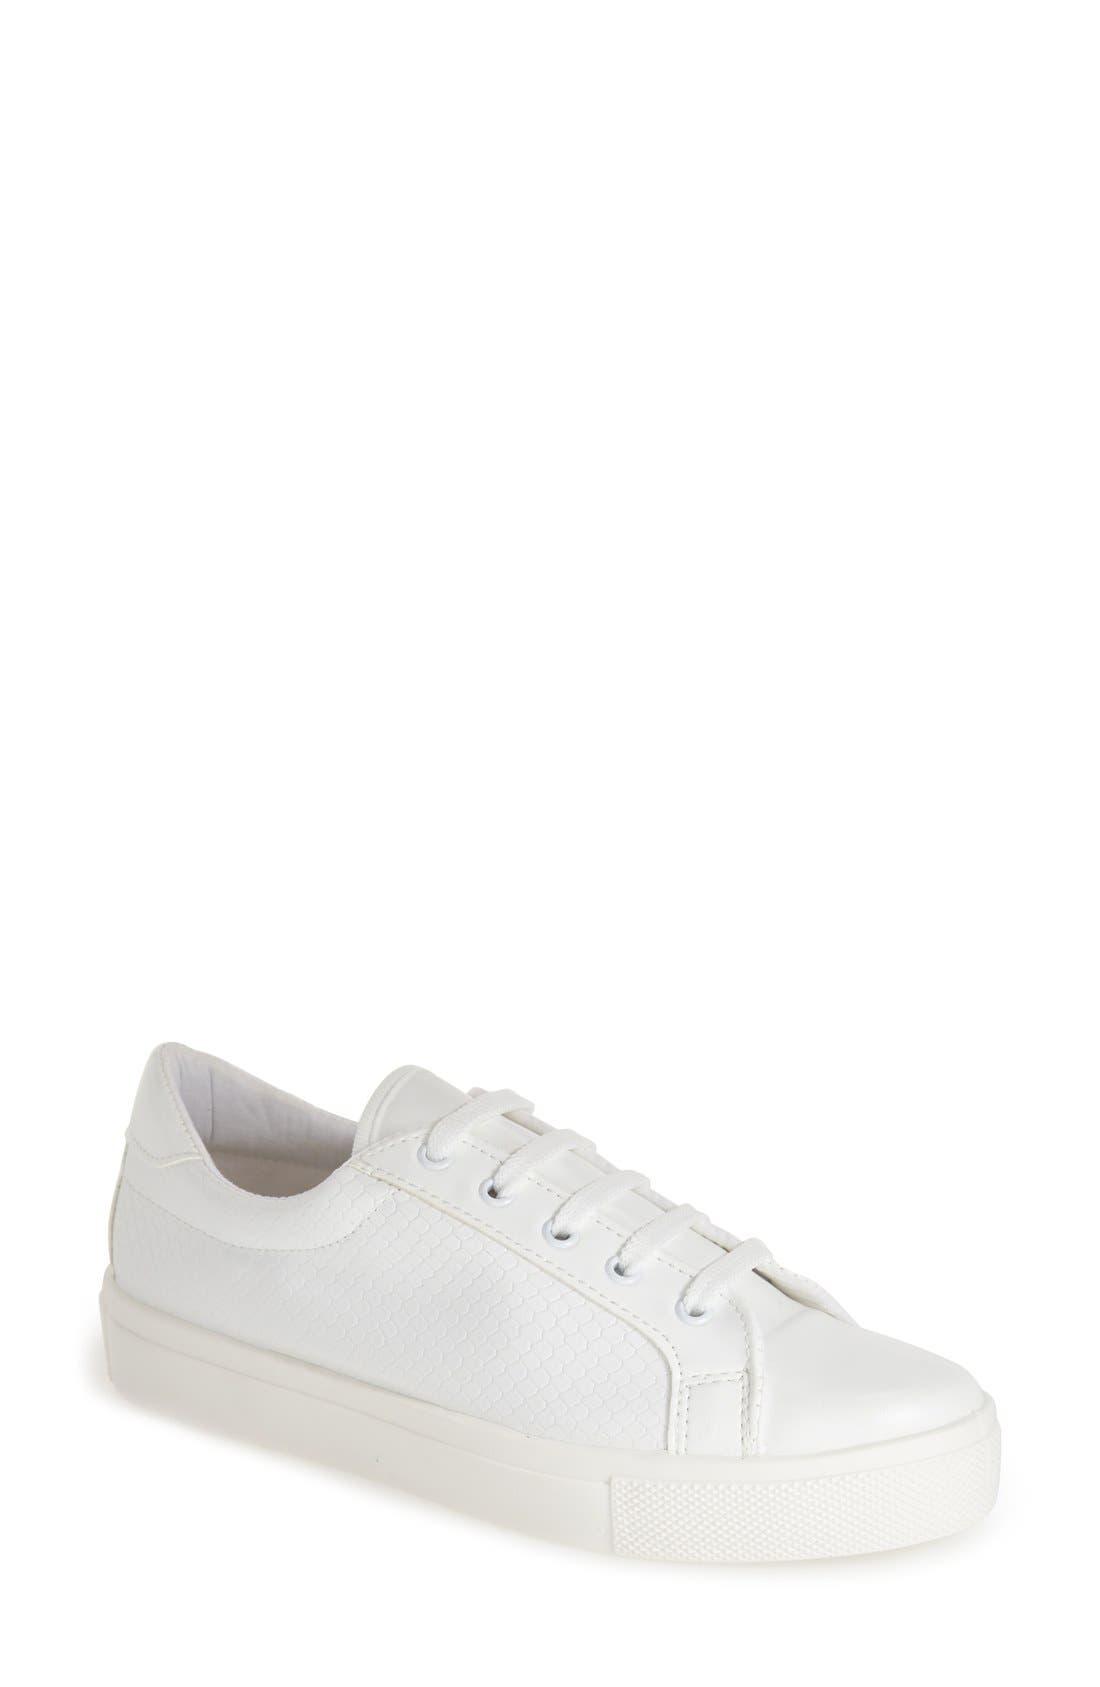 'Copenhagen' Lizard Embossed Faux Leather Sneaker,                         Main,                         color, White